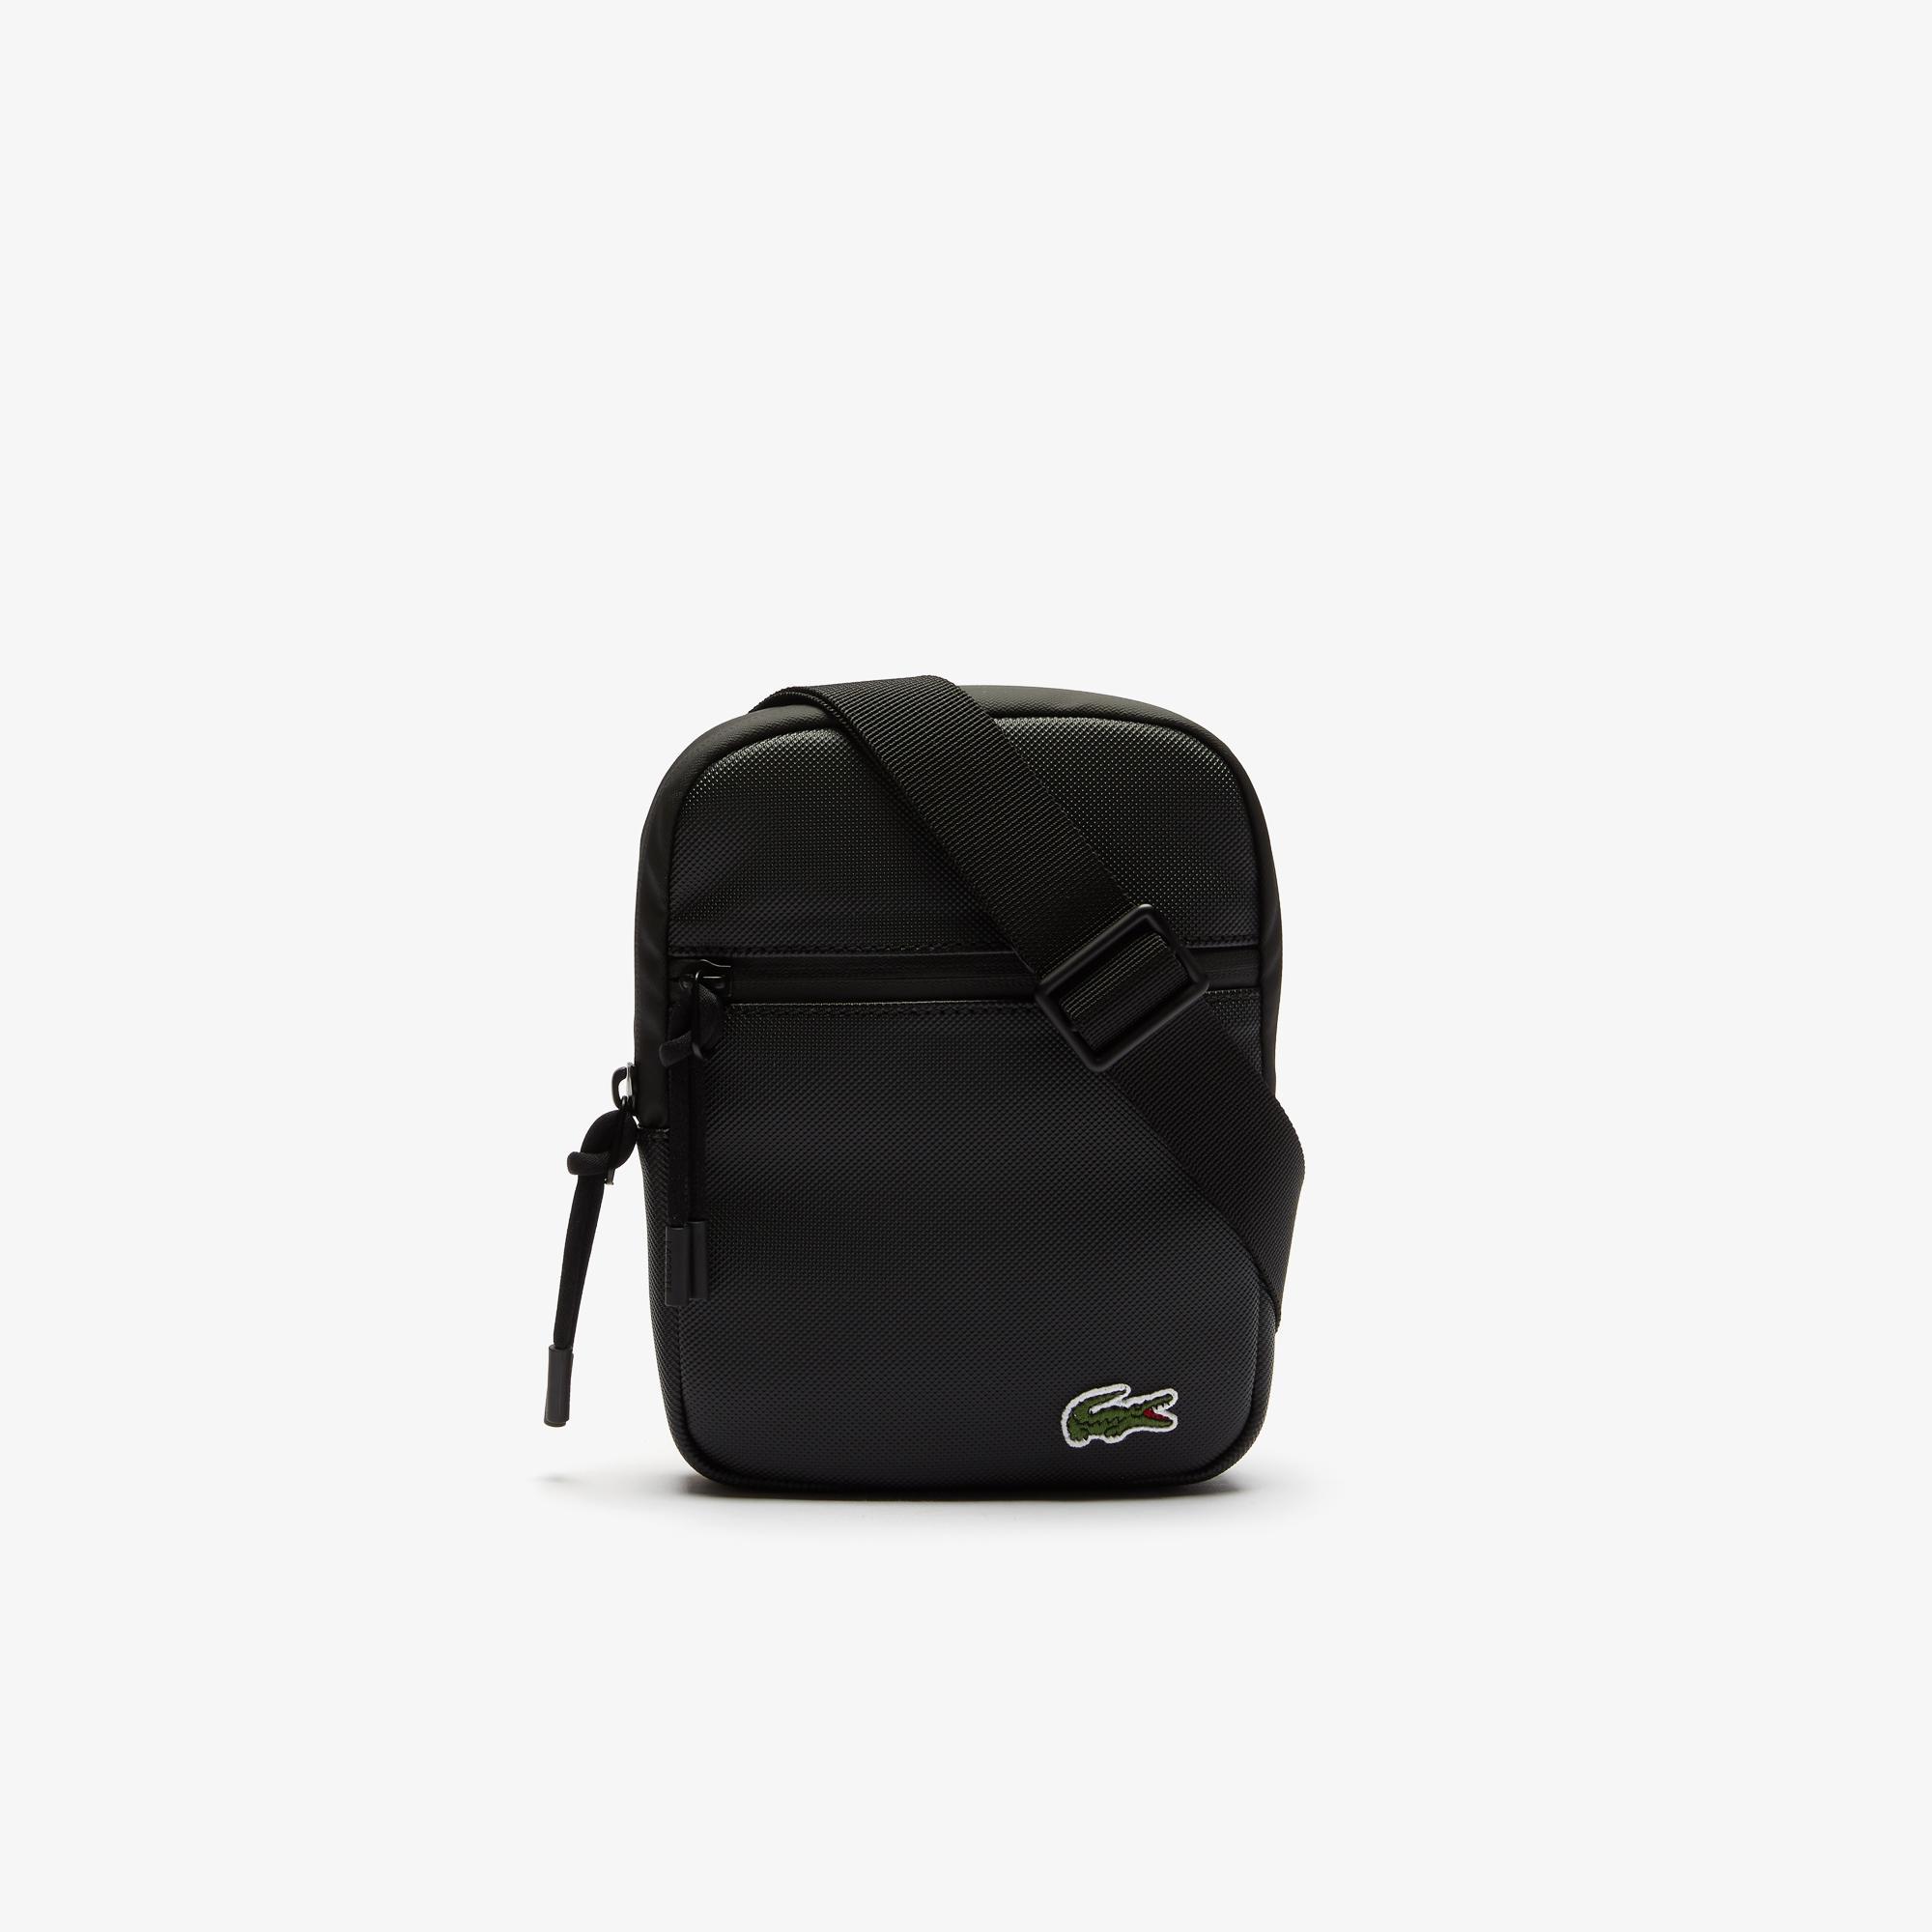 Lacoste Men Crossover Bag